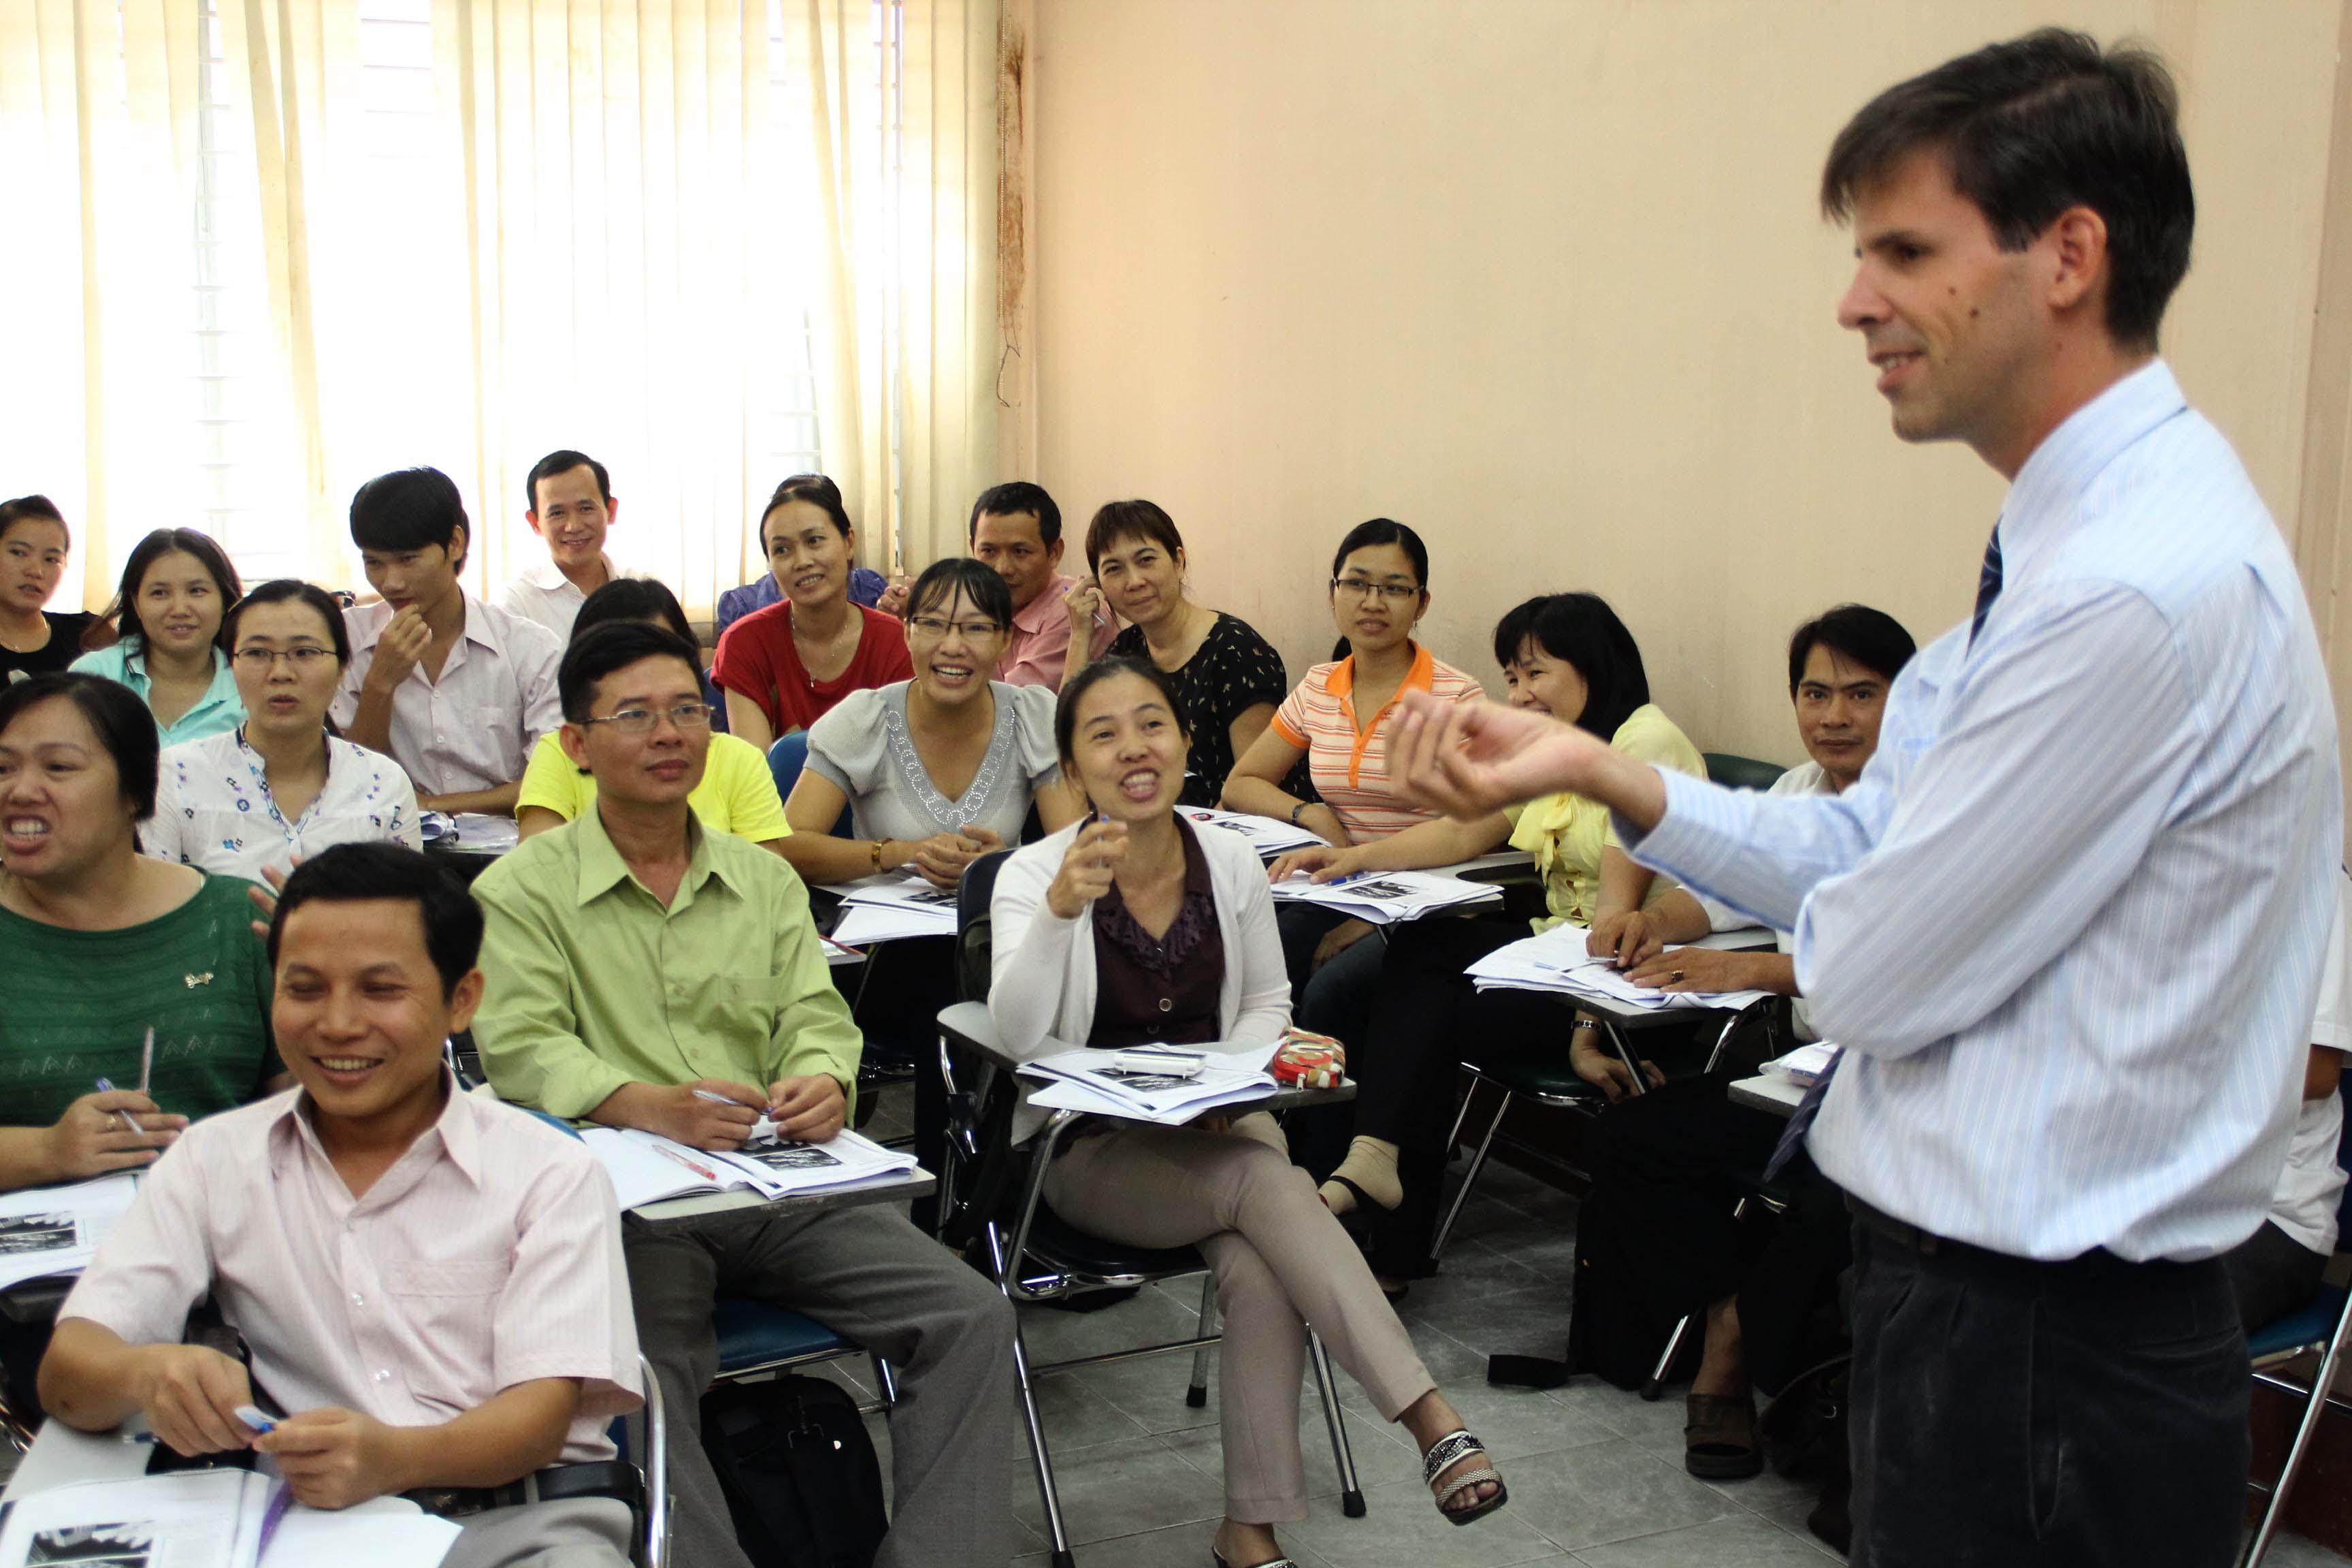 The English teachers in Vietnam